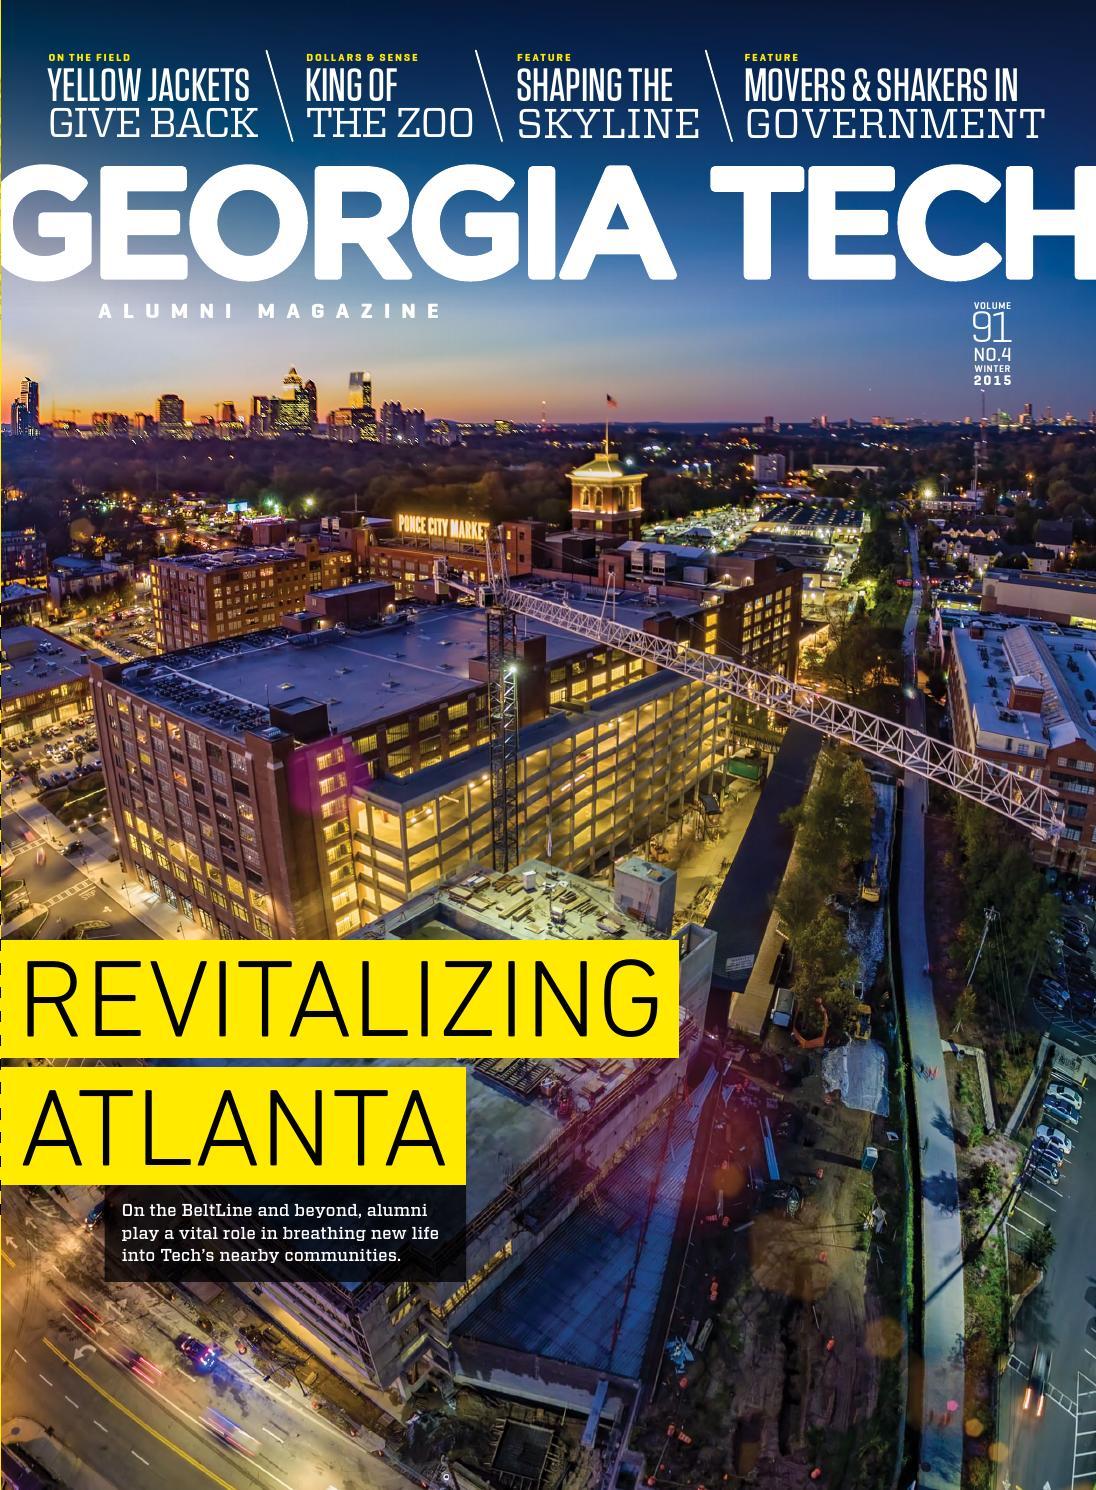 Georgia Tech Alumni Magazine Vol 91 No 4 2015 By Georgia Tech Alumni Association Issuu